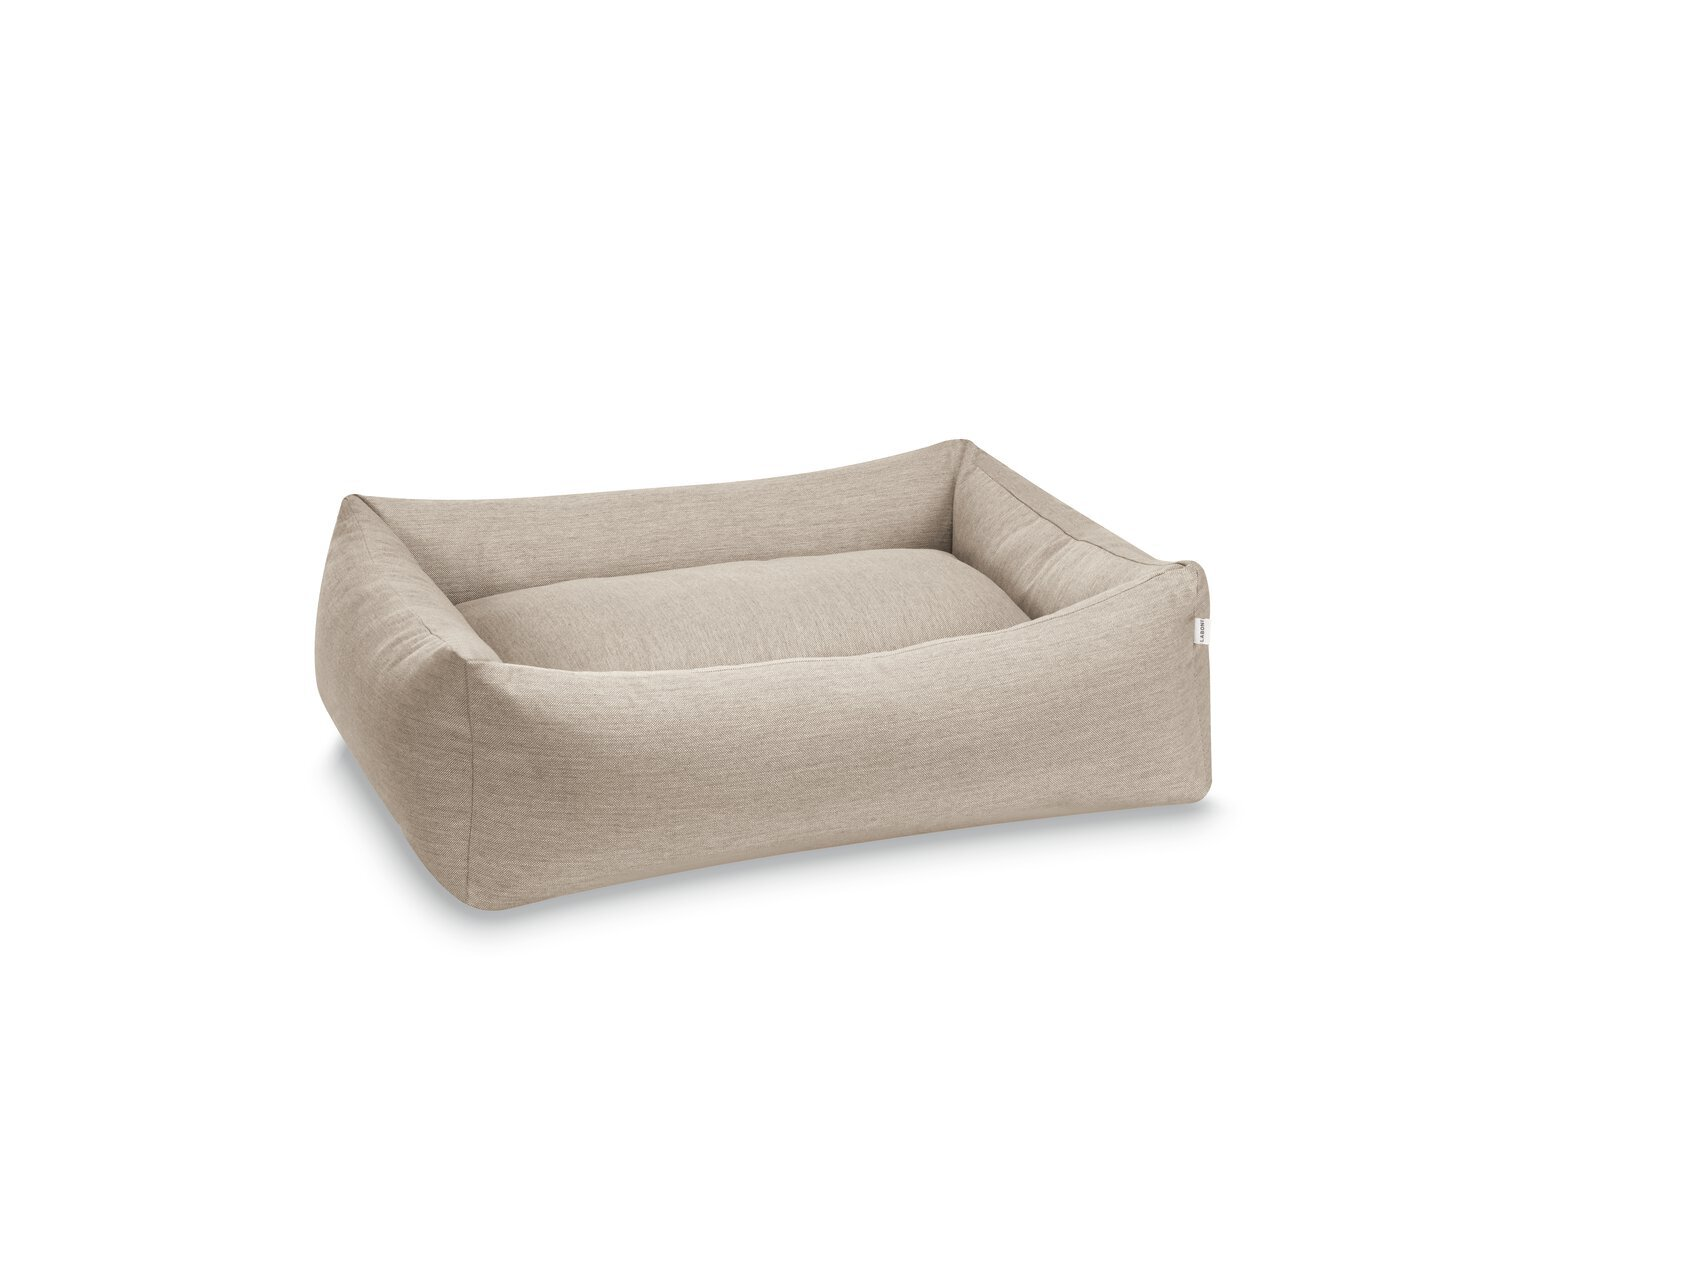 Bezug CLASSIC Hundebett M - SMOOTH - Lino